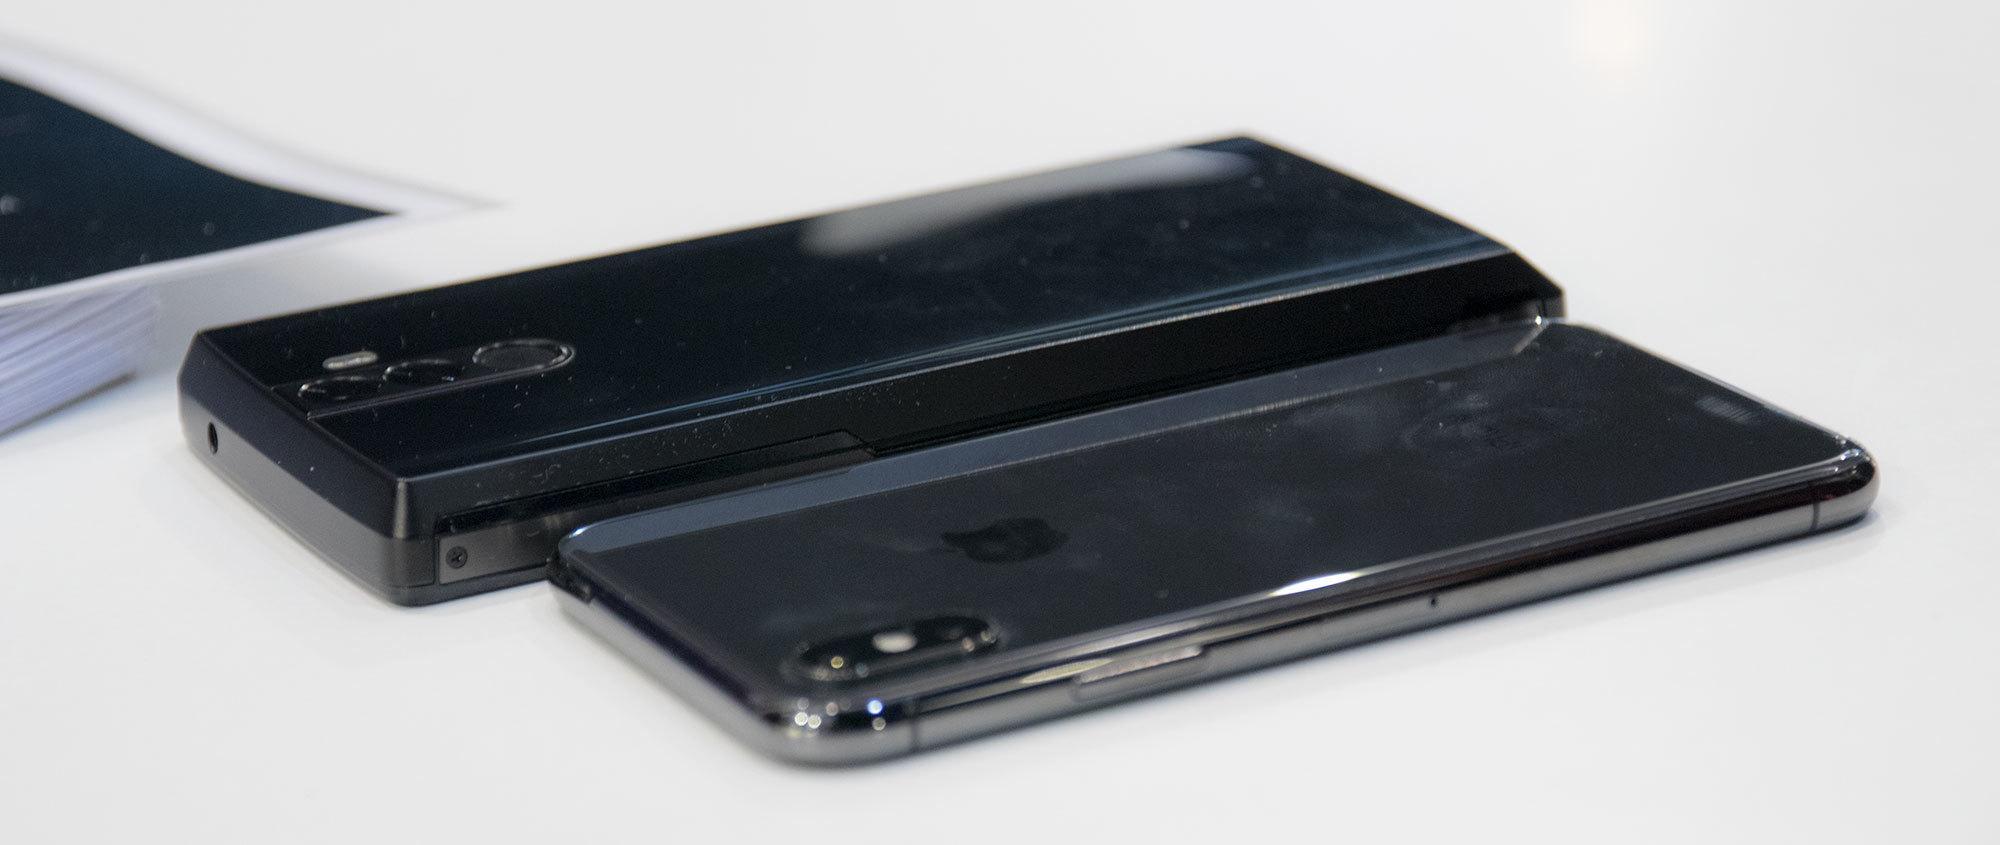 Power Max 16K Pro bak, iPhone X foran.